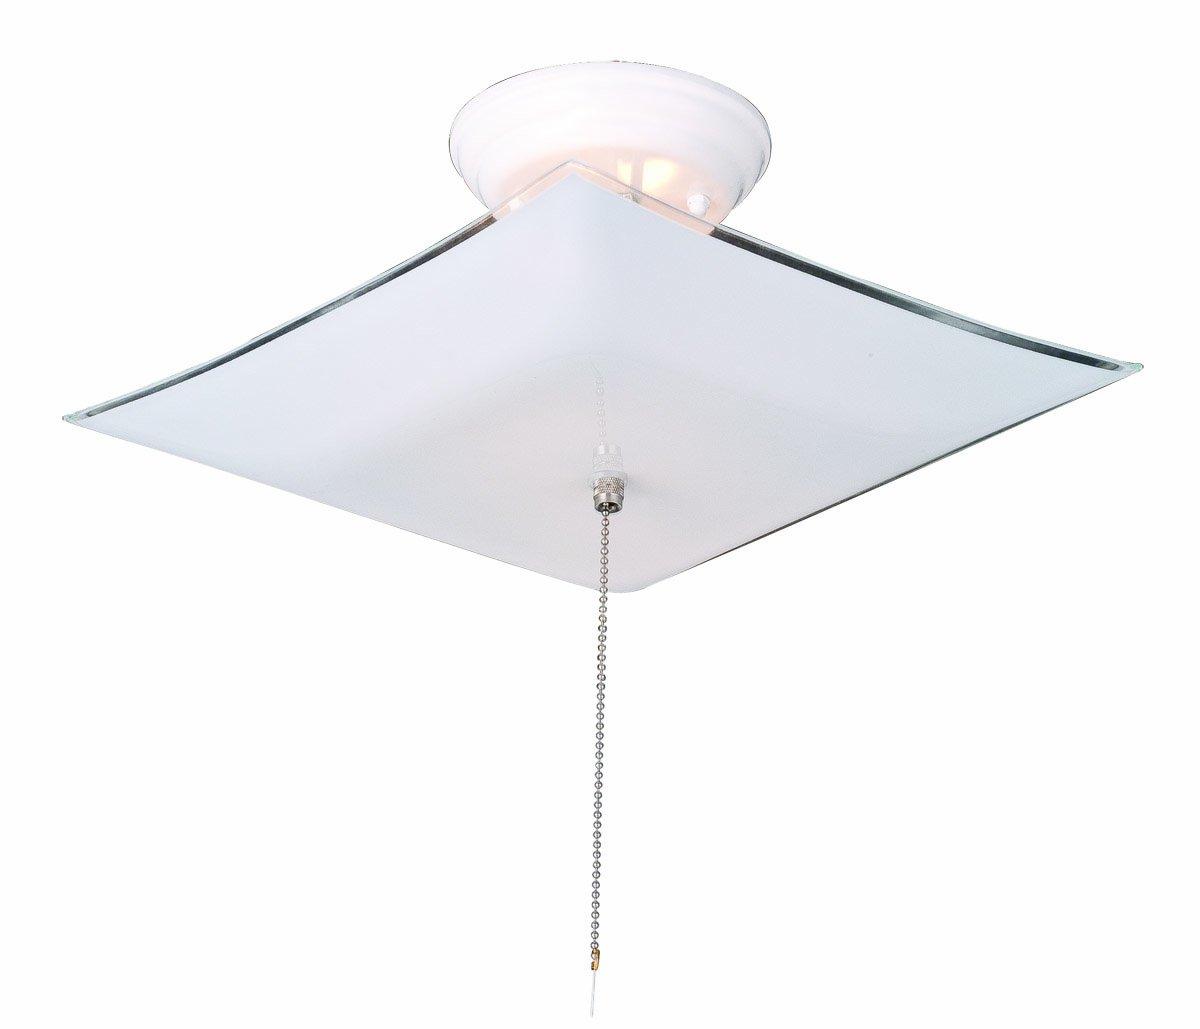 White Ceiling Light Fixture: Design House 517805 2 Light Ceiling Mount Light Fixture